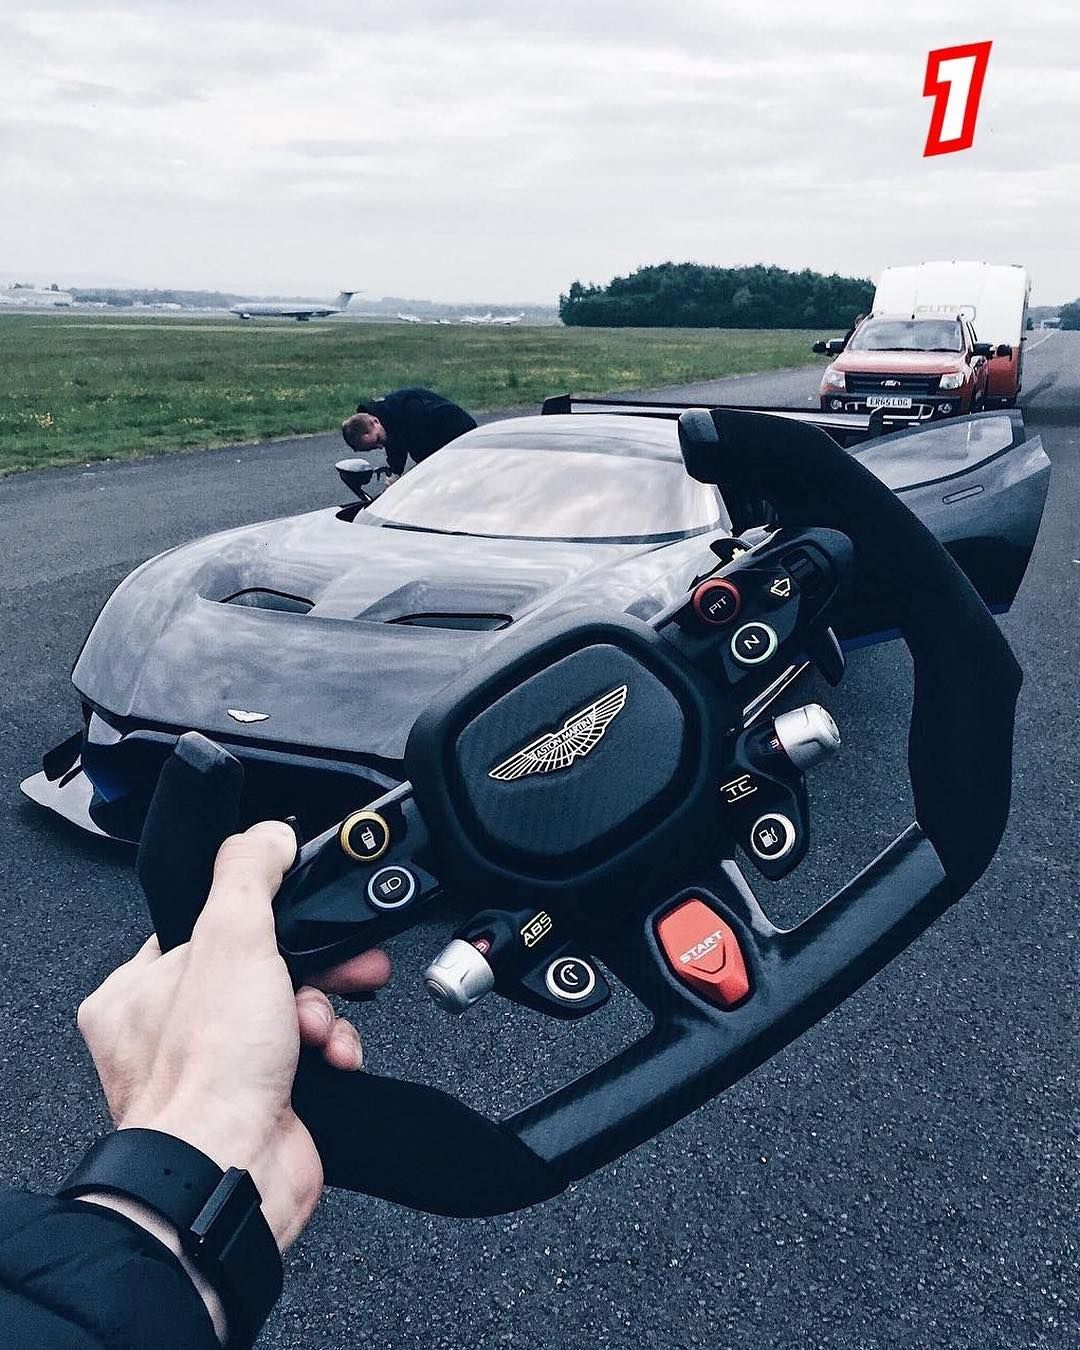 L�ks Otomobiller B�y�k  #cars #luxurycars #sportcars #conceptcars #motorcycles #trucks